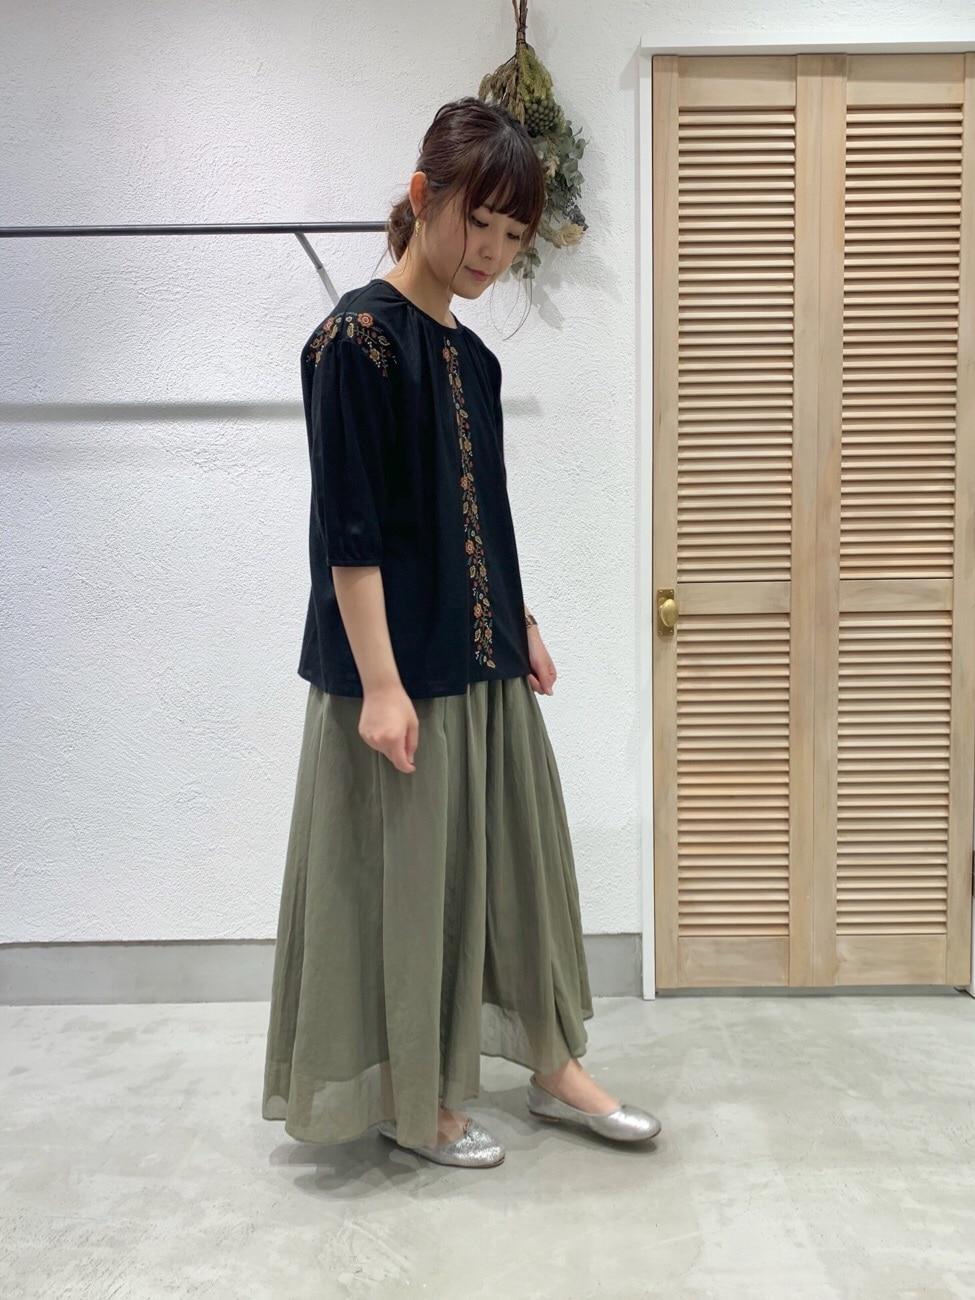 chambre de charme 横浜ジョイナス 身長:162cm 2020.06.11